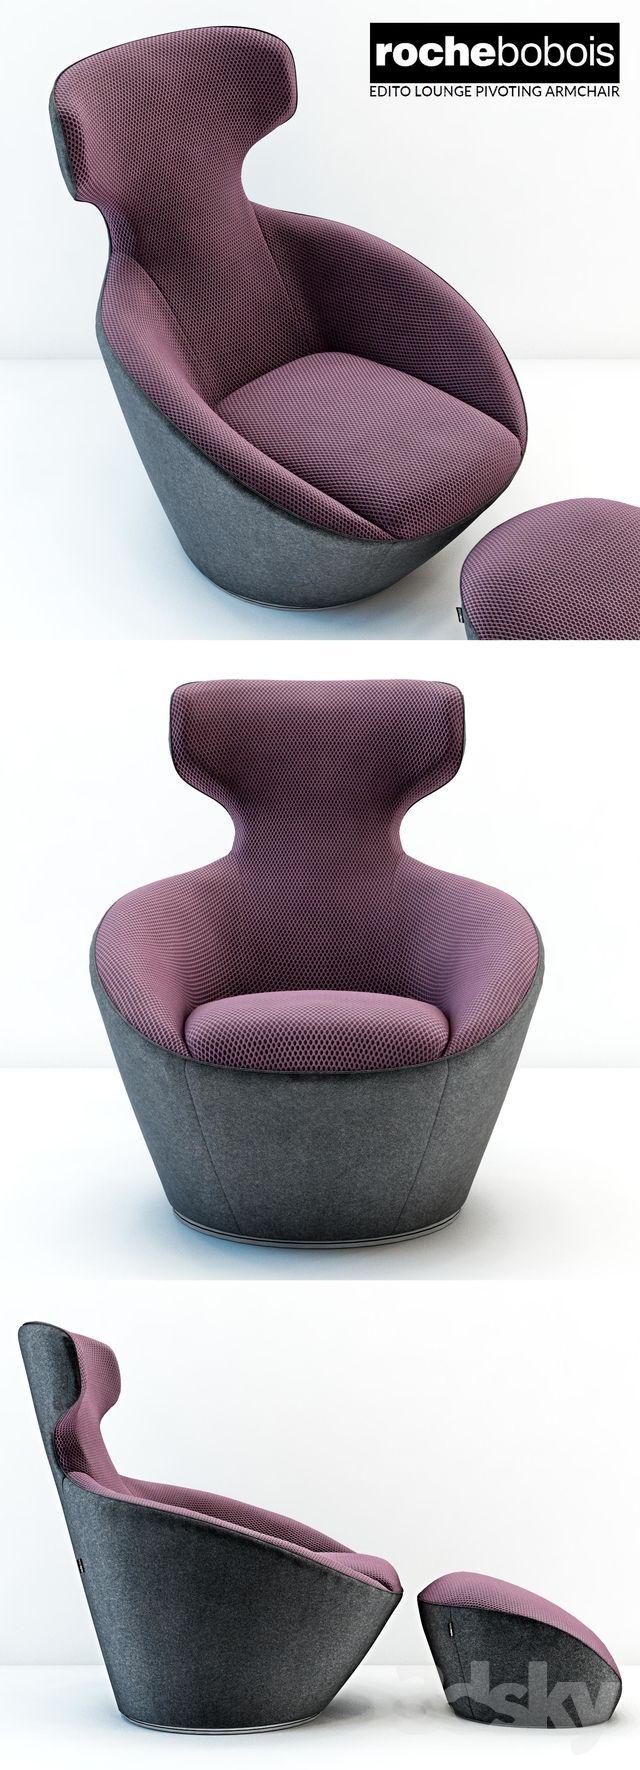 Peachy 3D Models Arm Chair Roche Bobois Edito Lounge Pivoting Beatyapartments Chair Design Images Beatyapartmentscom